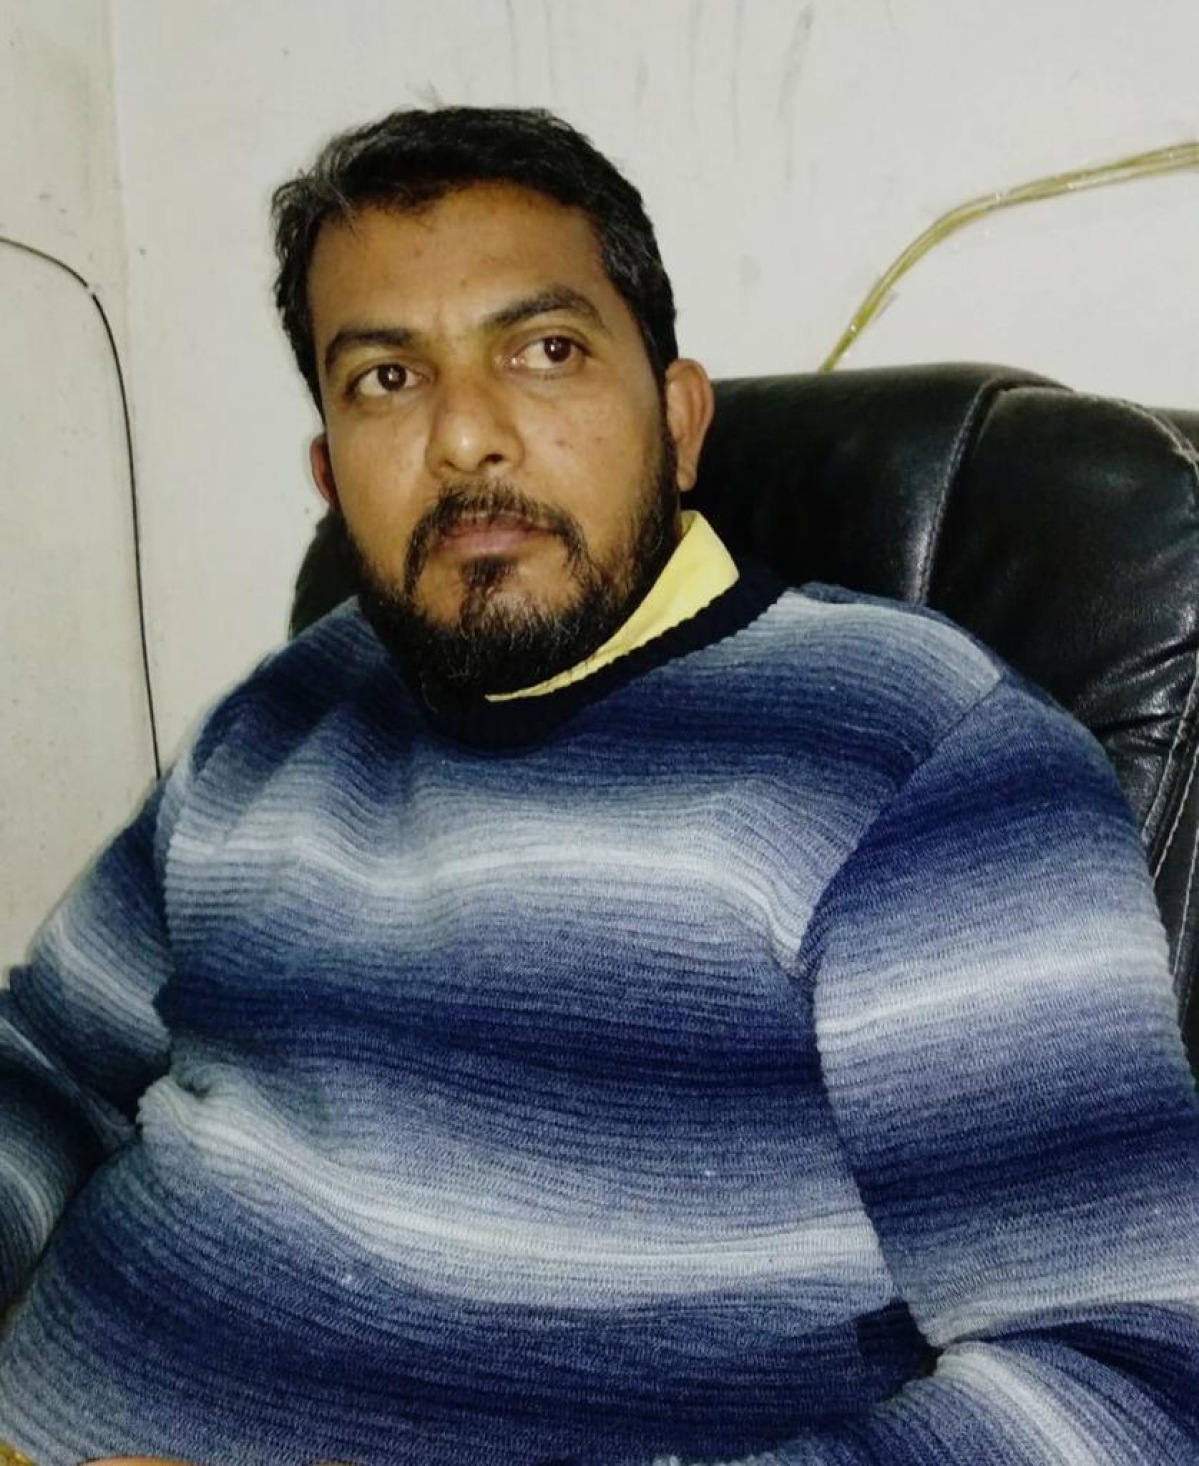 Sunil Saraswat